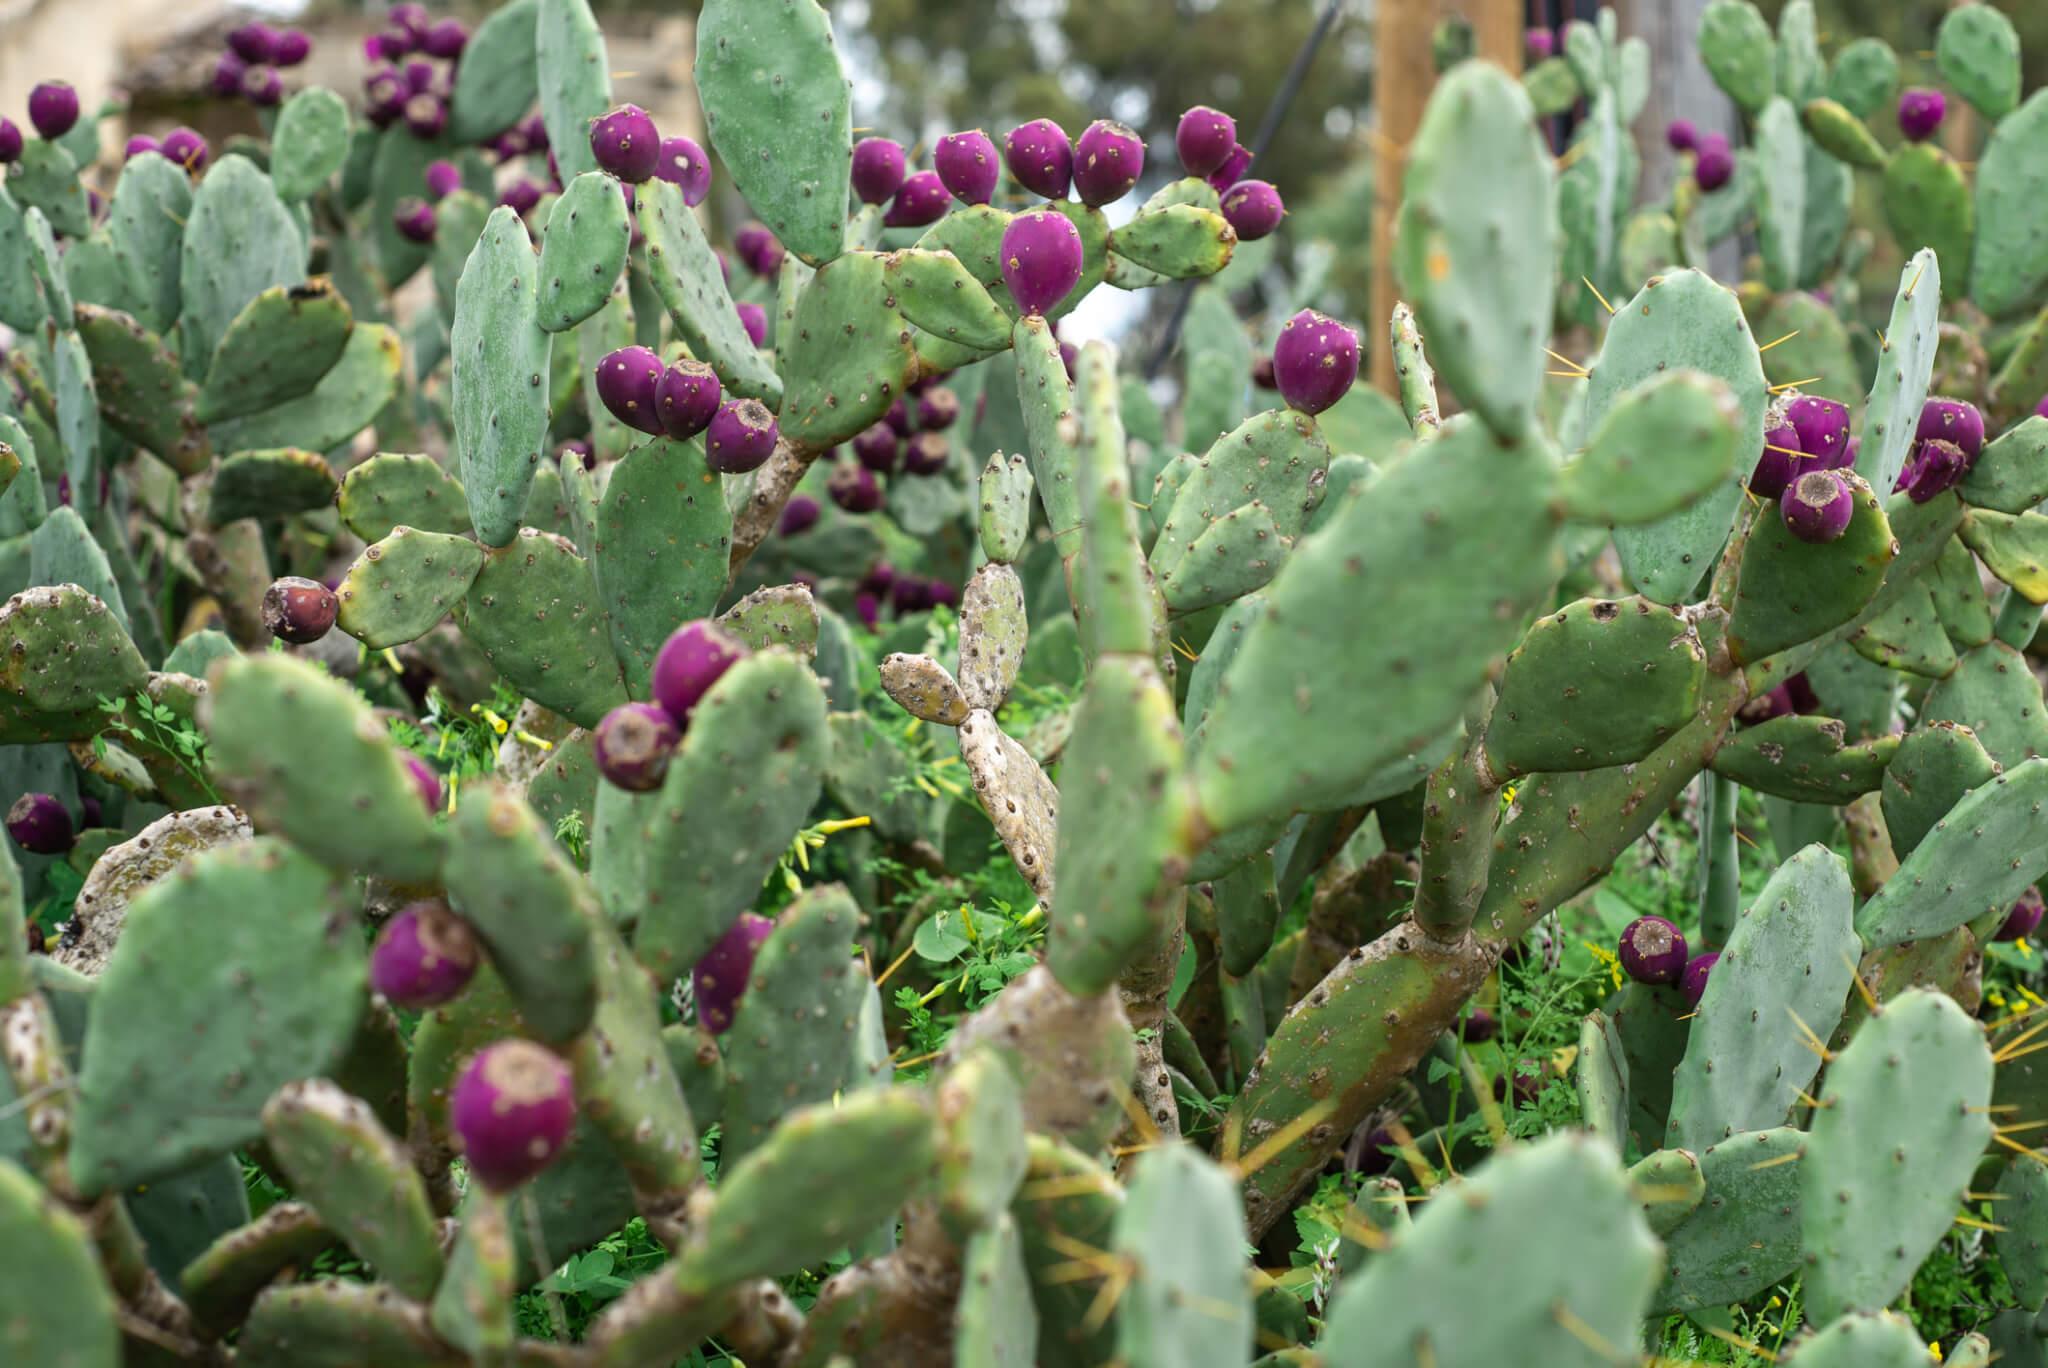 Eastern Prickly Pear Fruit